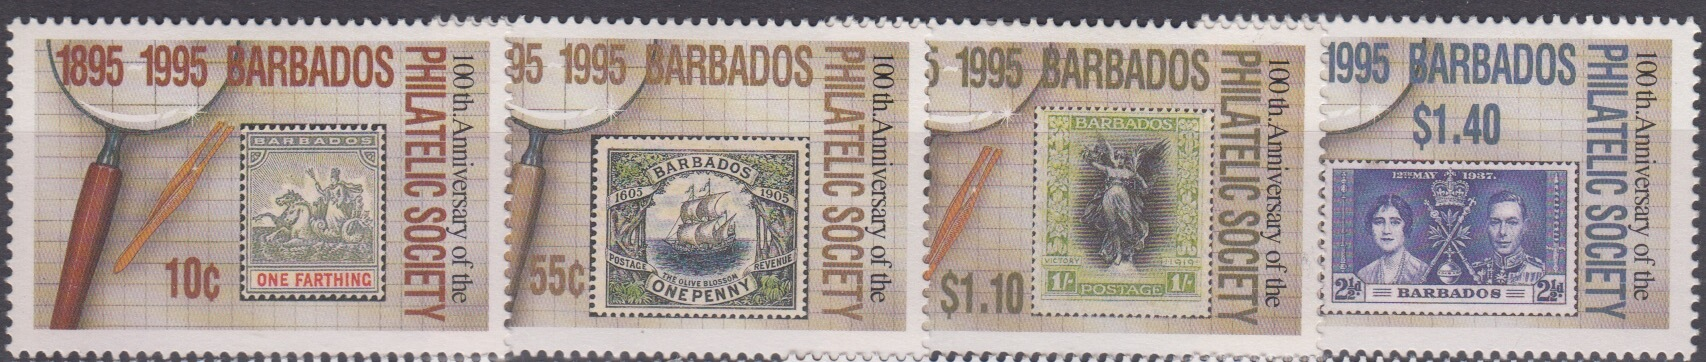 Barbados SG 1066-69 | Centenary of Barbados Philatelic Society